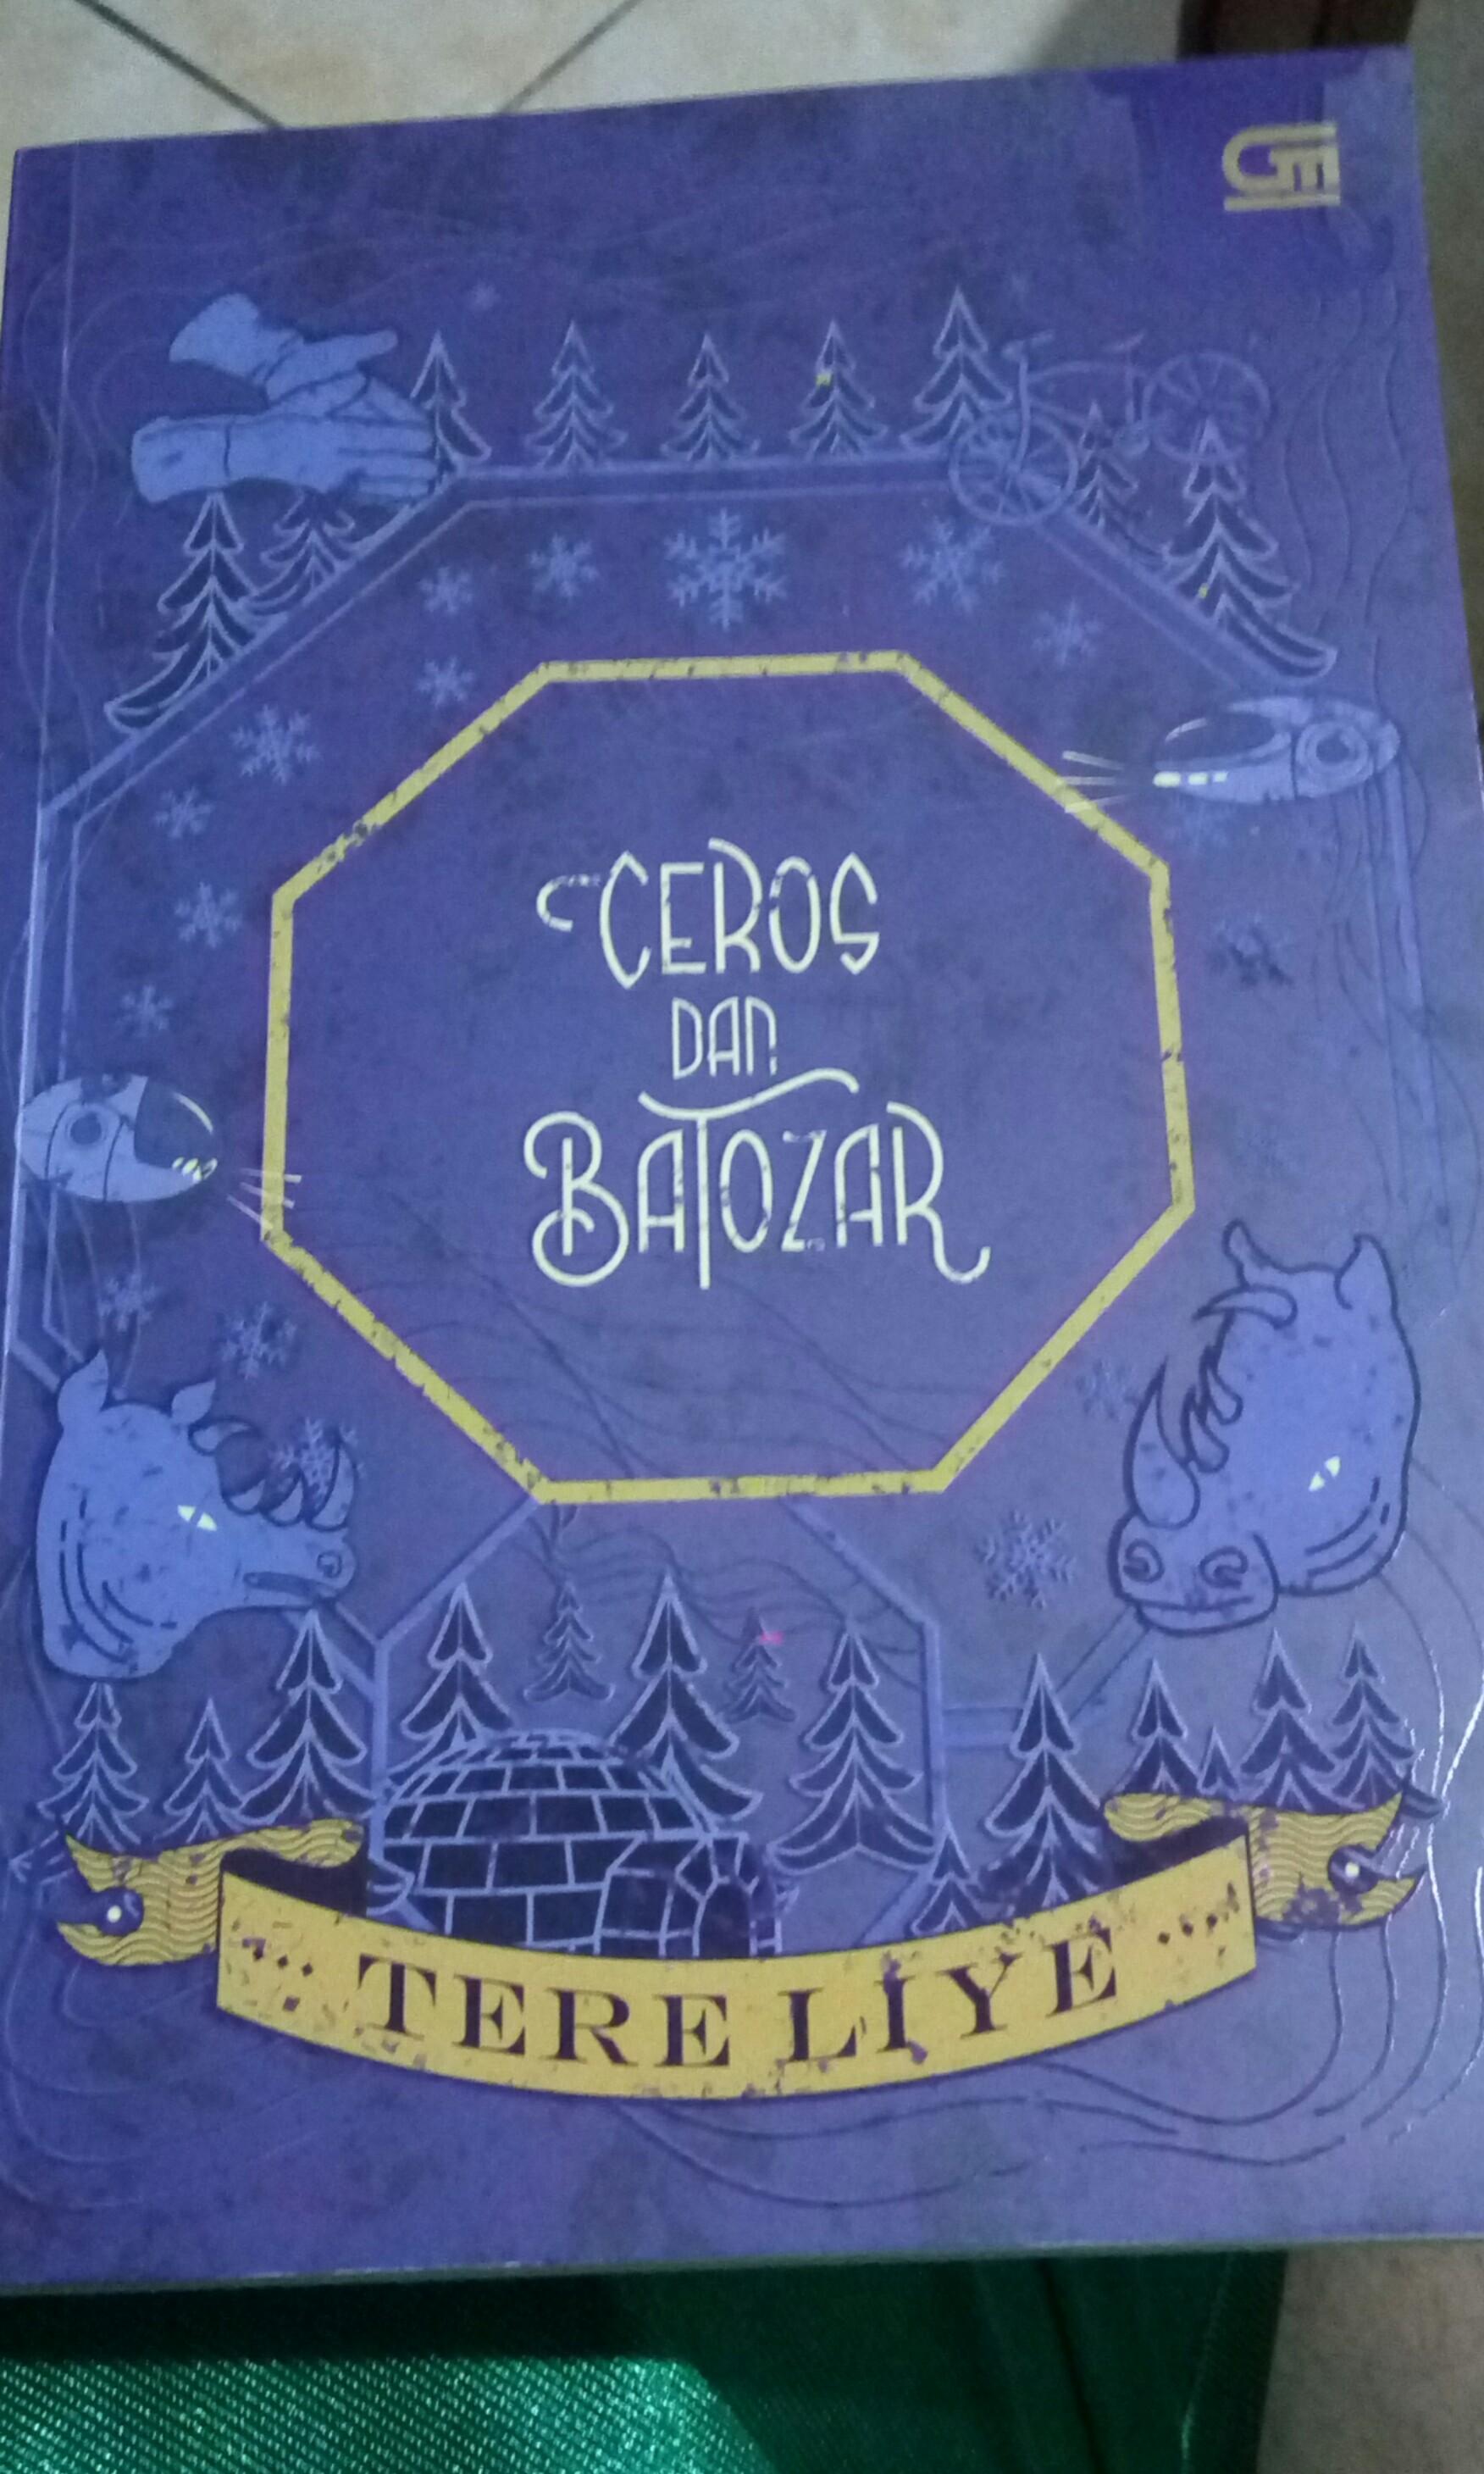 1 Paket Novel Tere Liye Ceros Dan Batozar Komet Books Bintang Stationery On Carousell